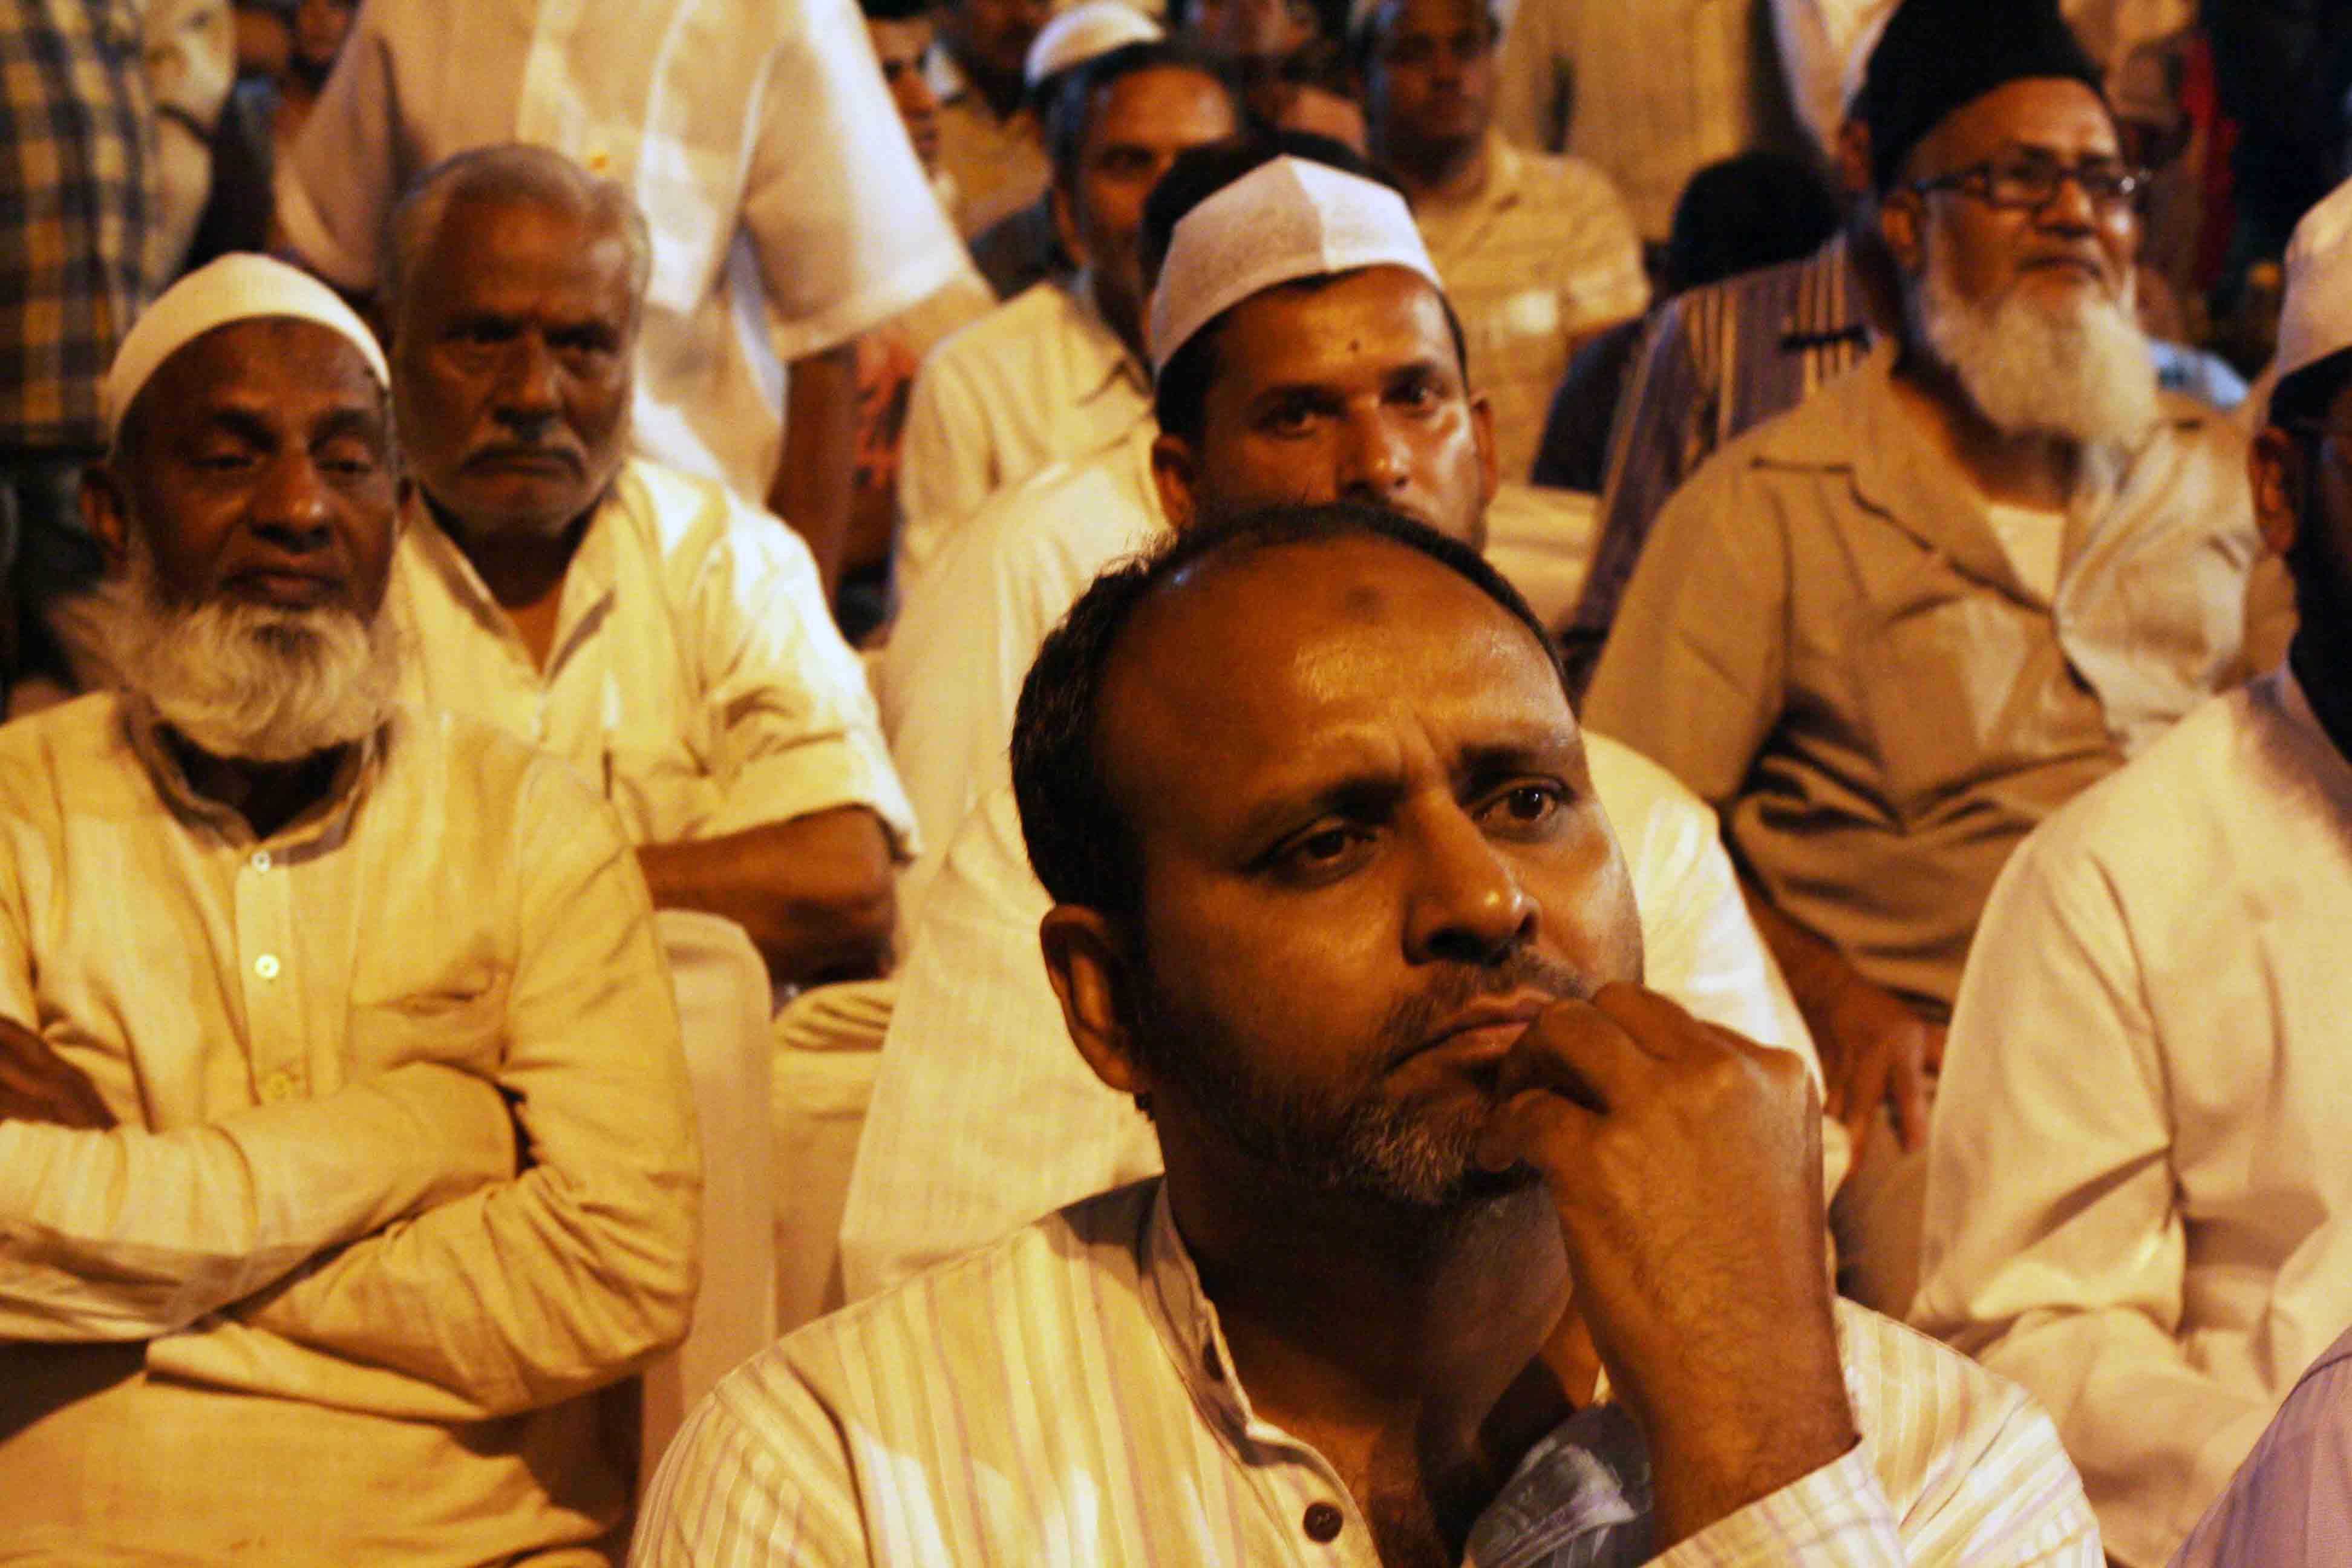 City Notes - National Election, Jama Masjid